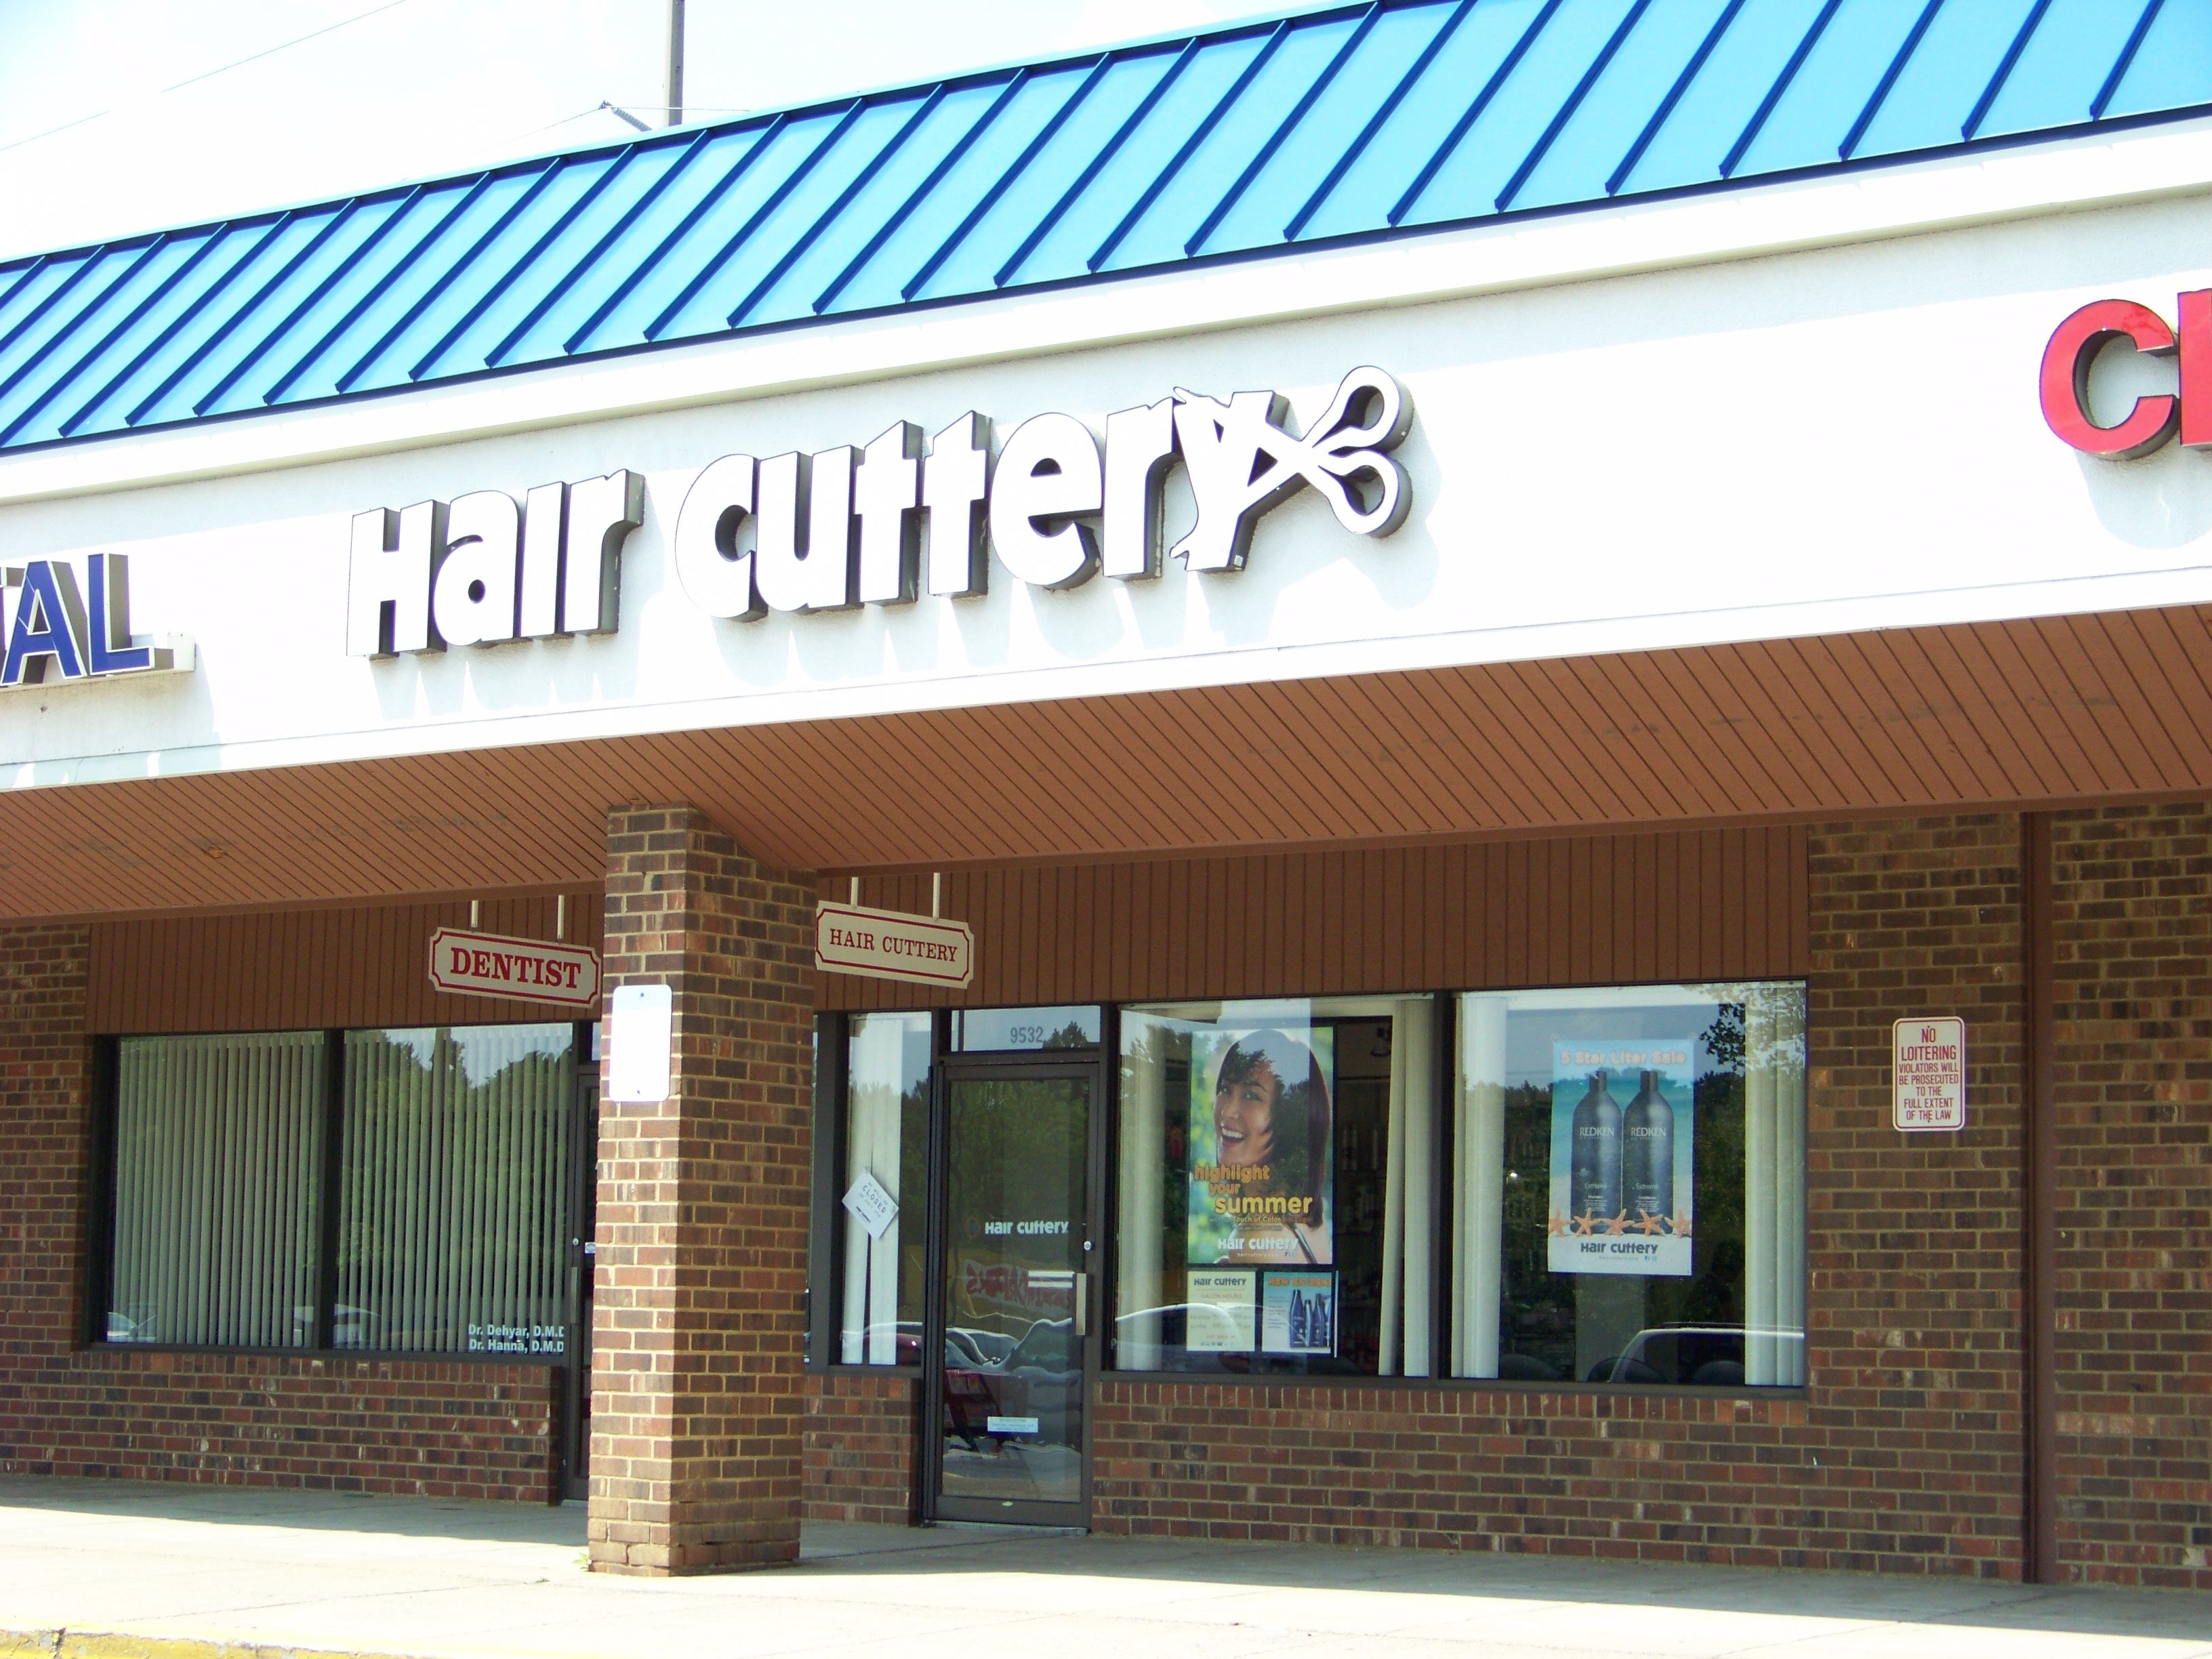 Hair Cuttery Burke 9532 Burke Rd, Burke, VA 22015 (703